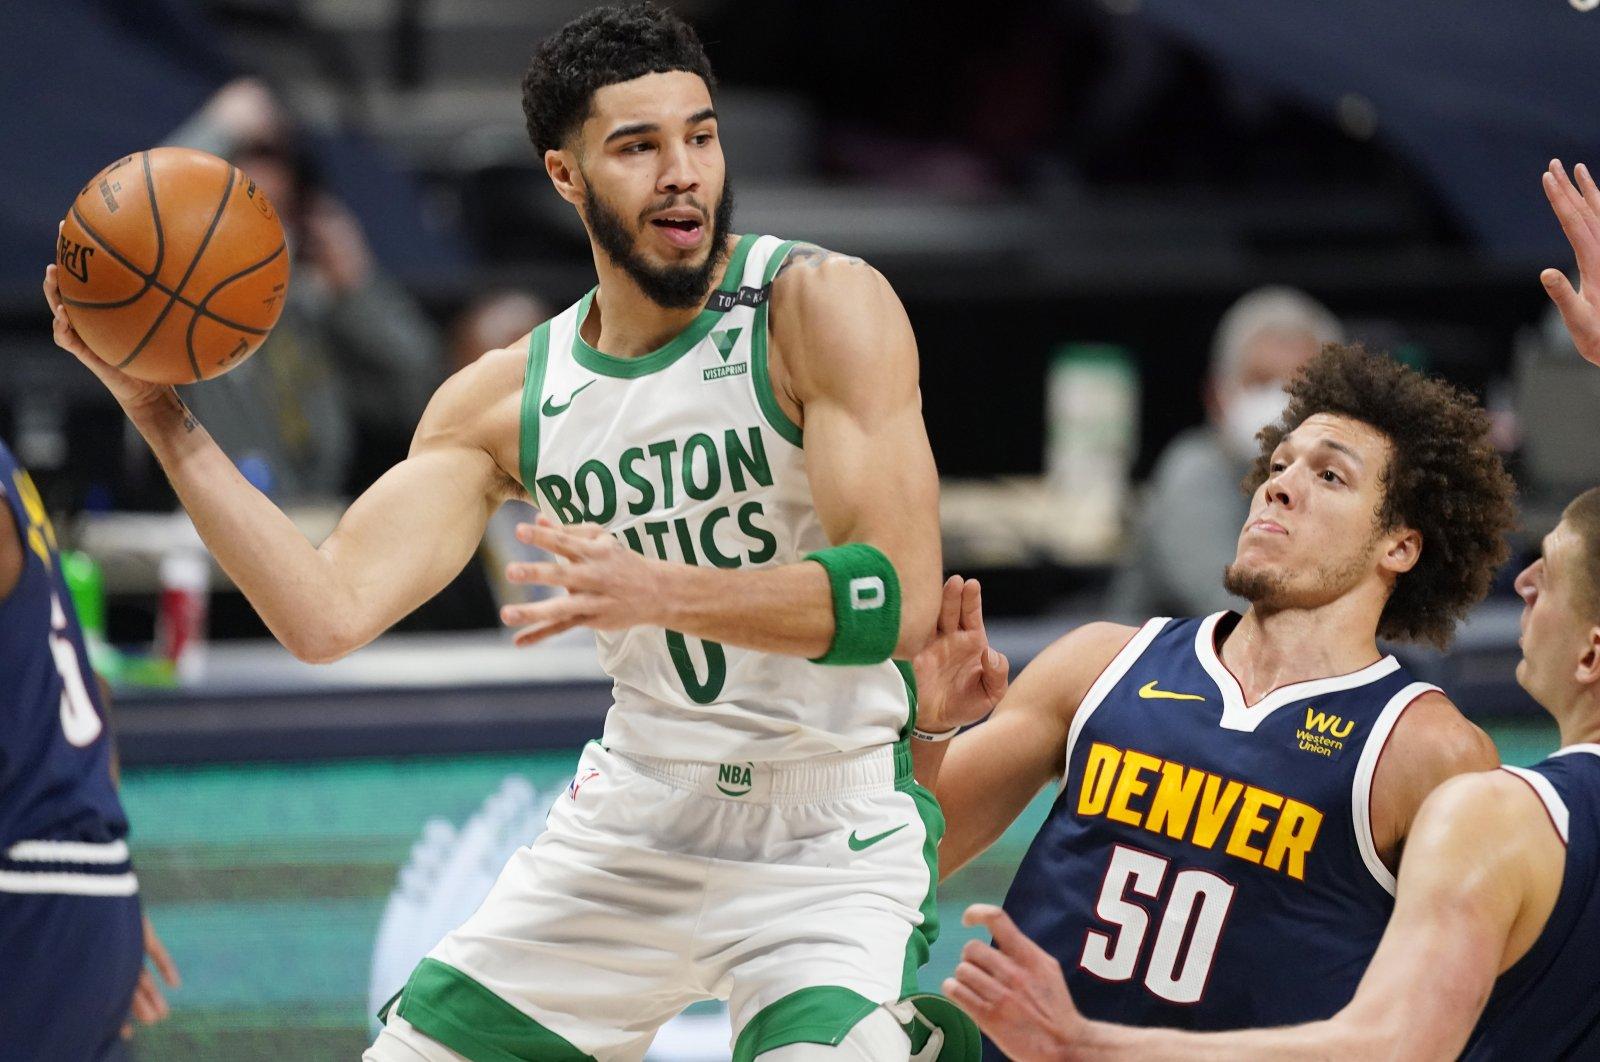 Boston Celtics forward Jayson Tatum (L) passes the ball as Denver Nuggets forward Aaron Gordon (C) and center Nikola Jokic defend during an NBA basketball game, Denver, U.S., April 11, 2021. (AP Photo)